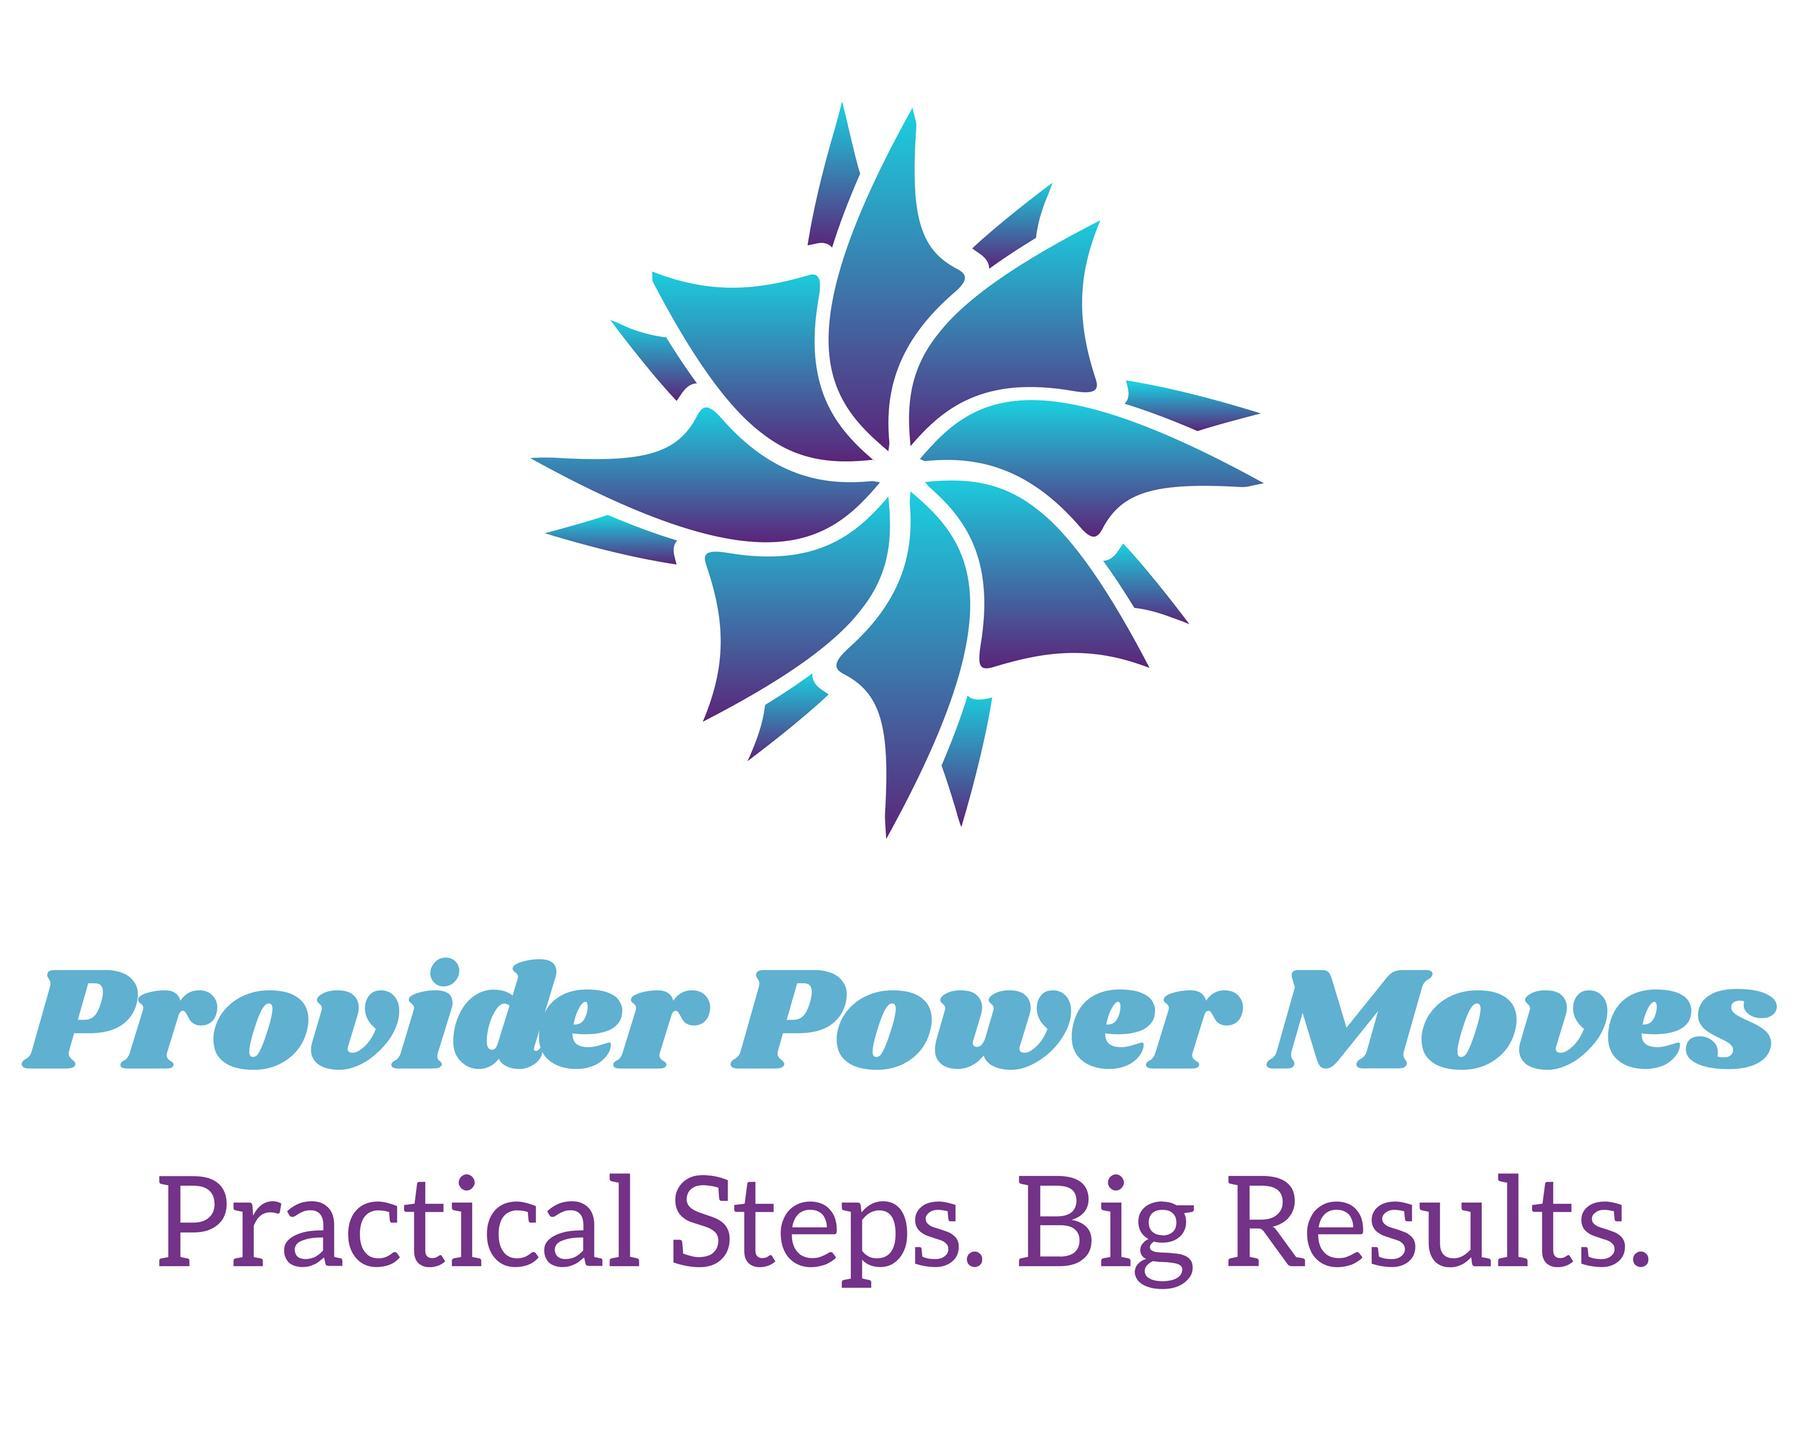 Provider Power Moves